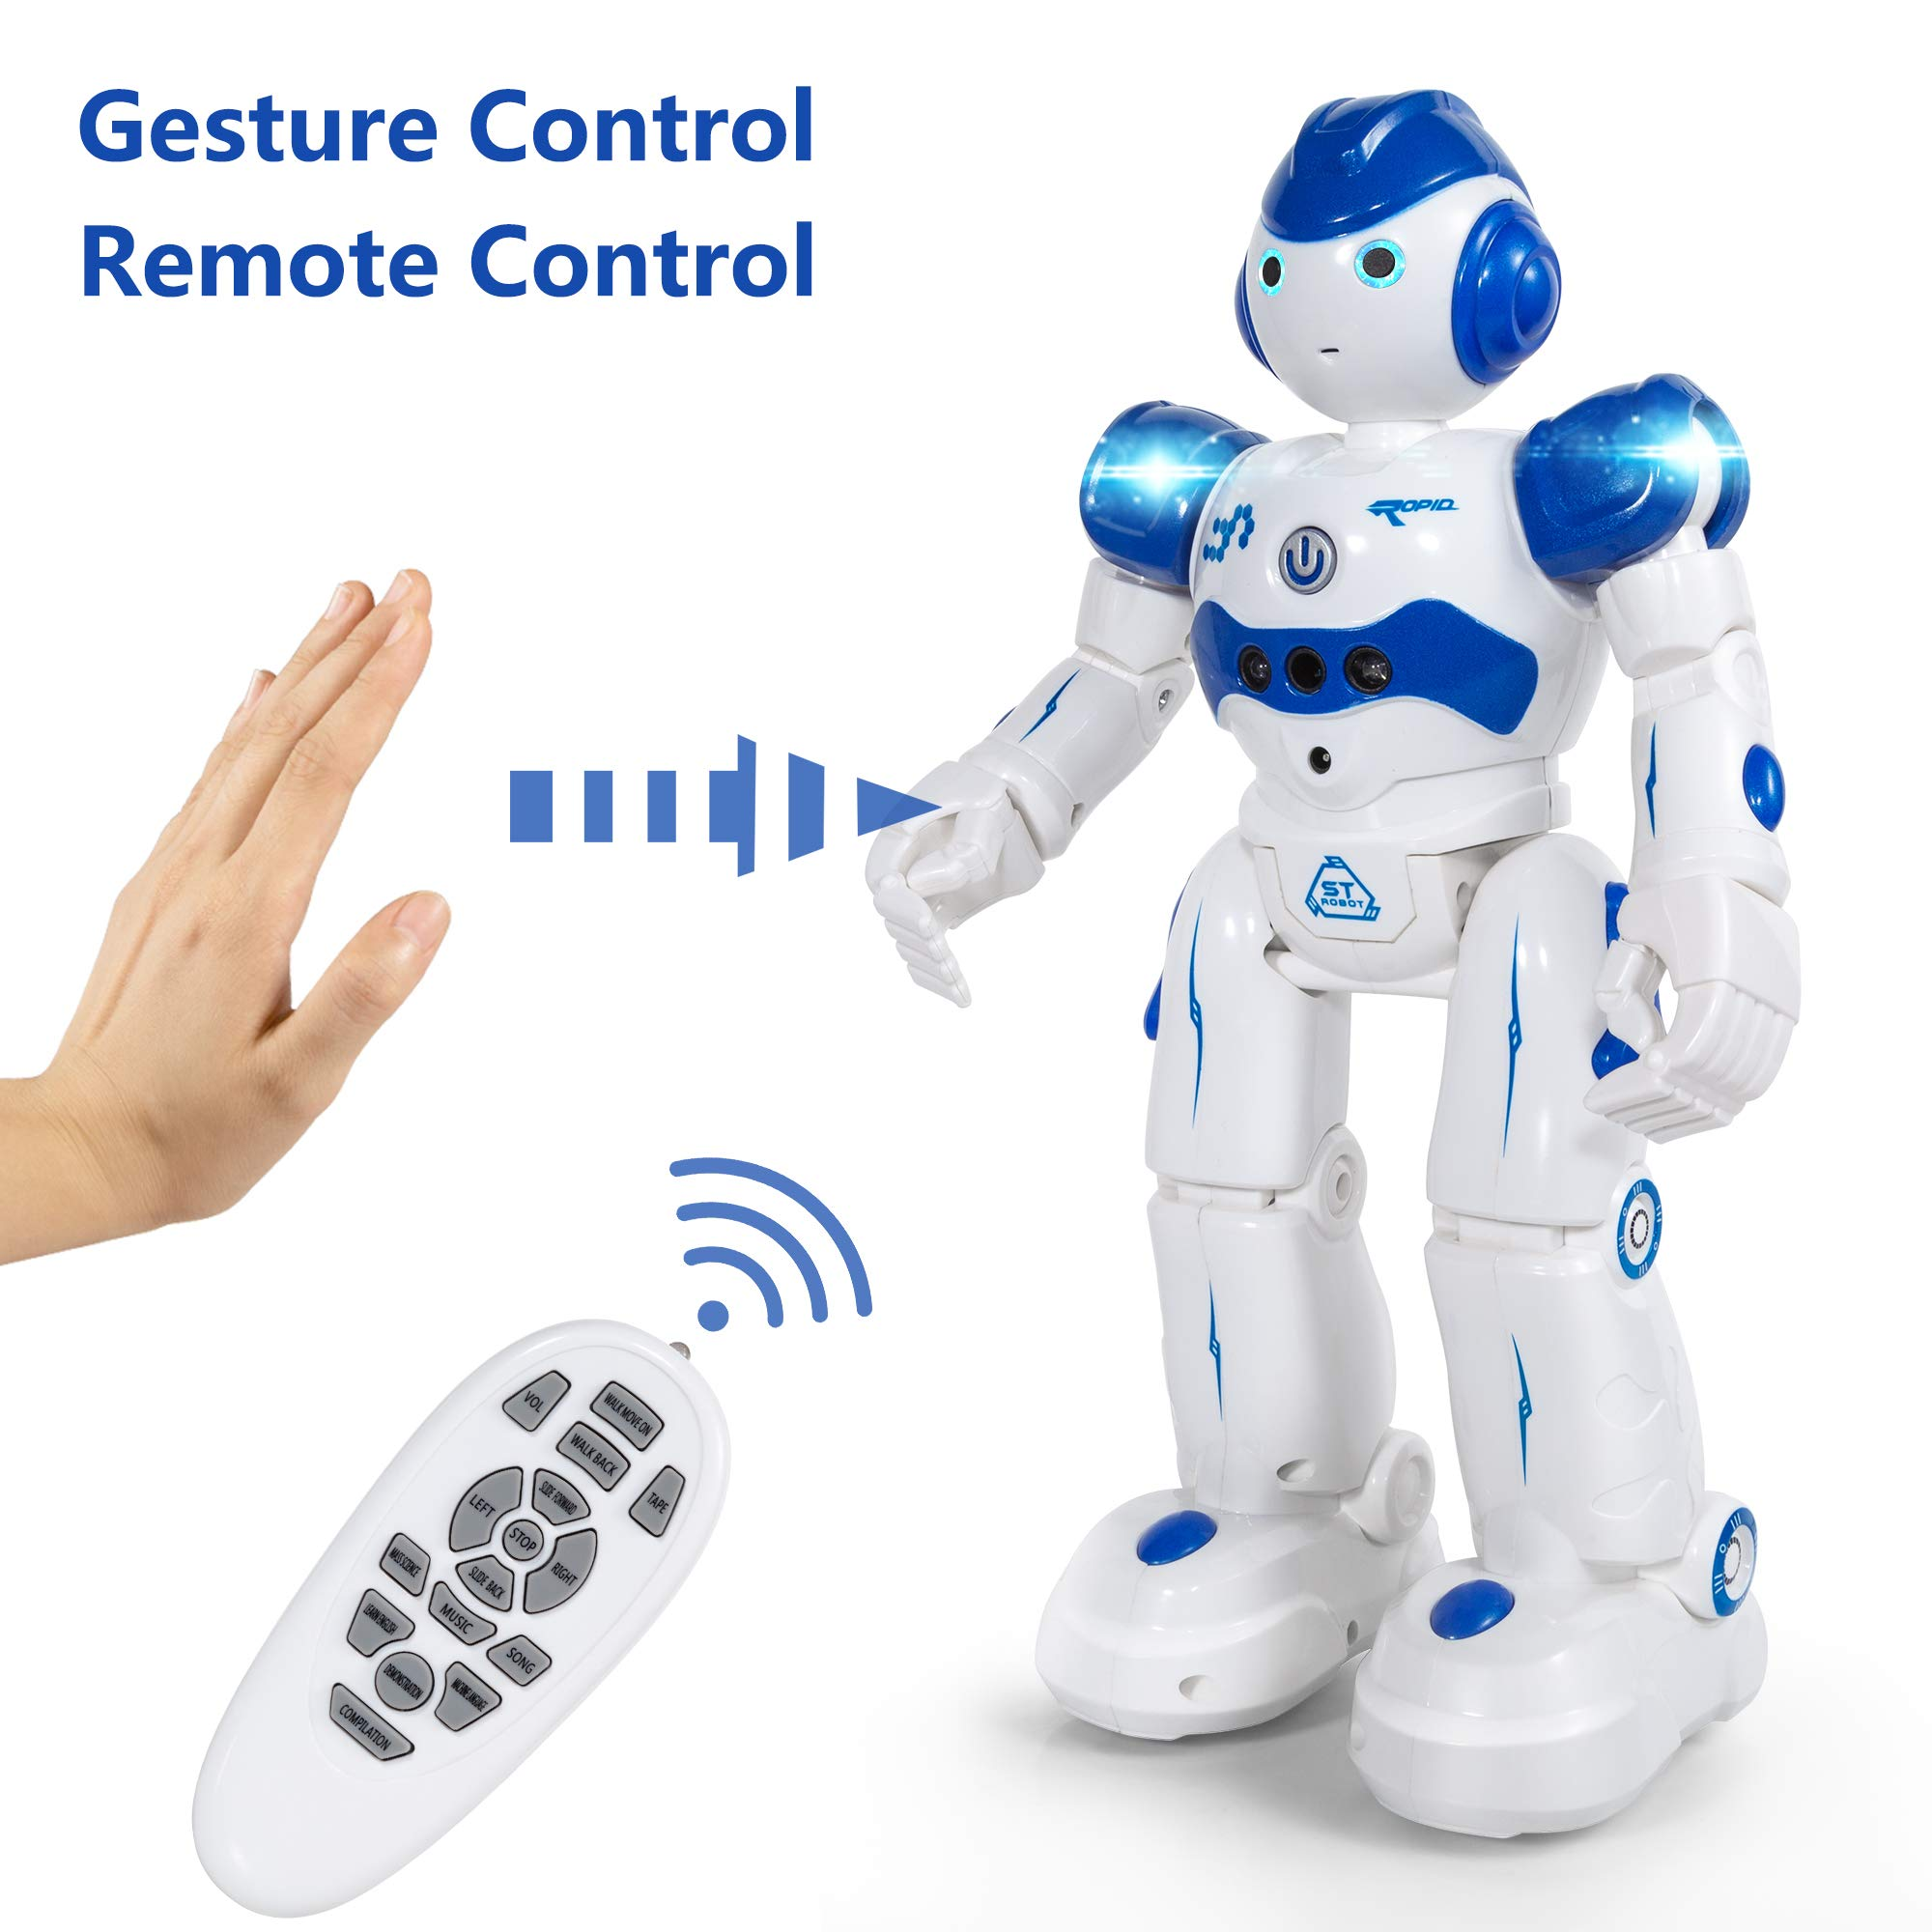 JIMITE Remote Control Robot Kids, Intellectual Gesture Sensor & RC Remote Control Rechargeable Robot Toys Kids Walking, Sliding, Turning, Singing, Dancing, Speaking Teaching Science